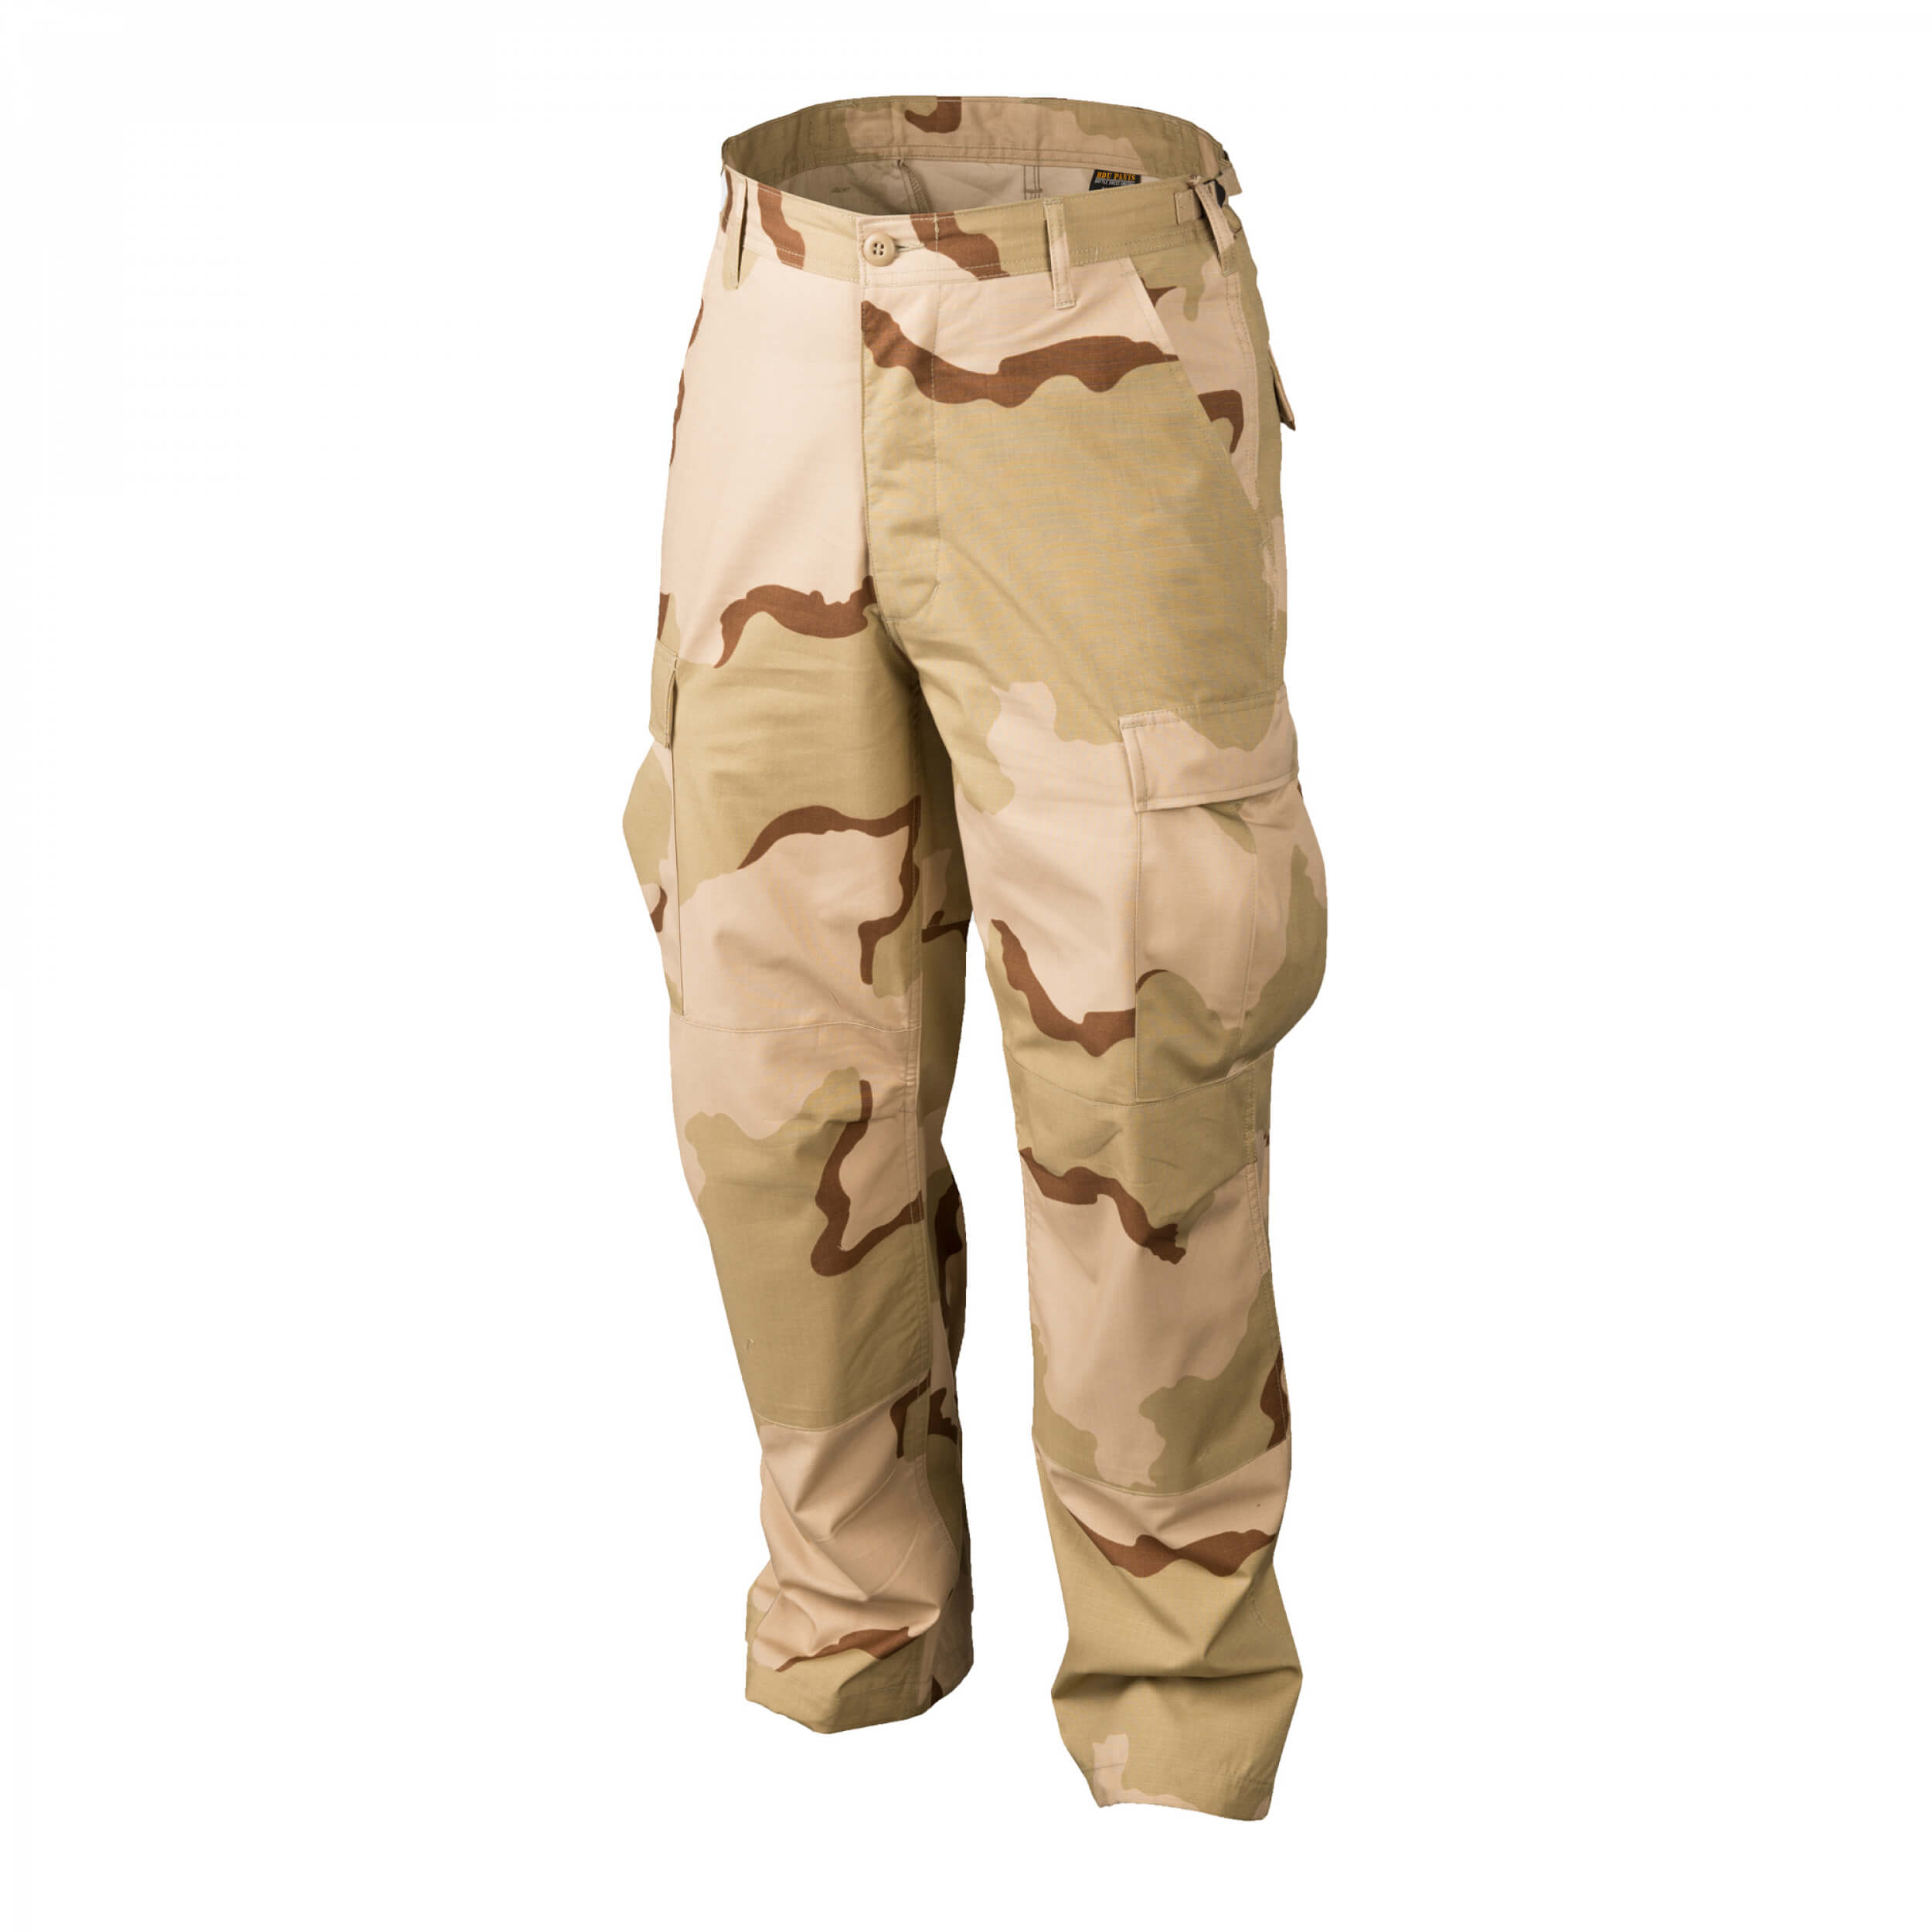 Helikon-Tex BDU Trousers - Cotton Ripstop - US Desert